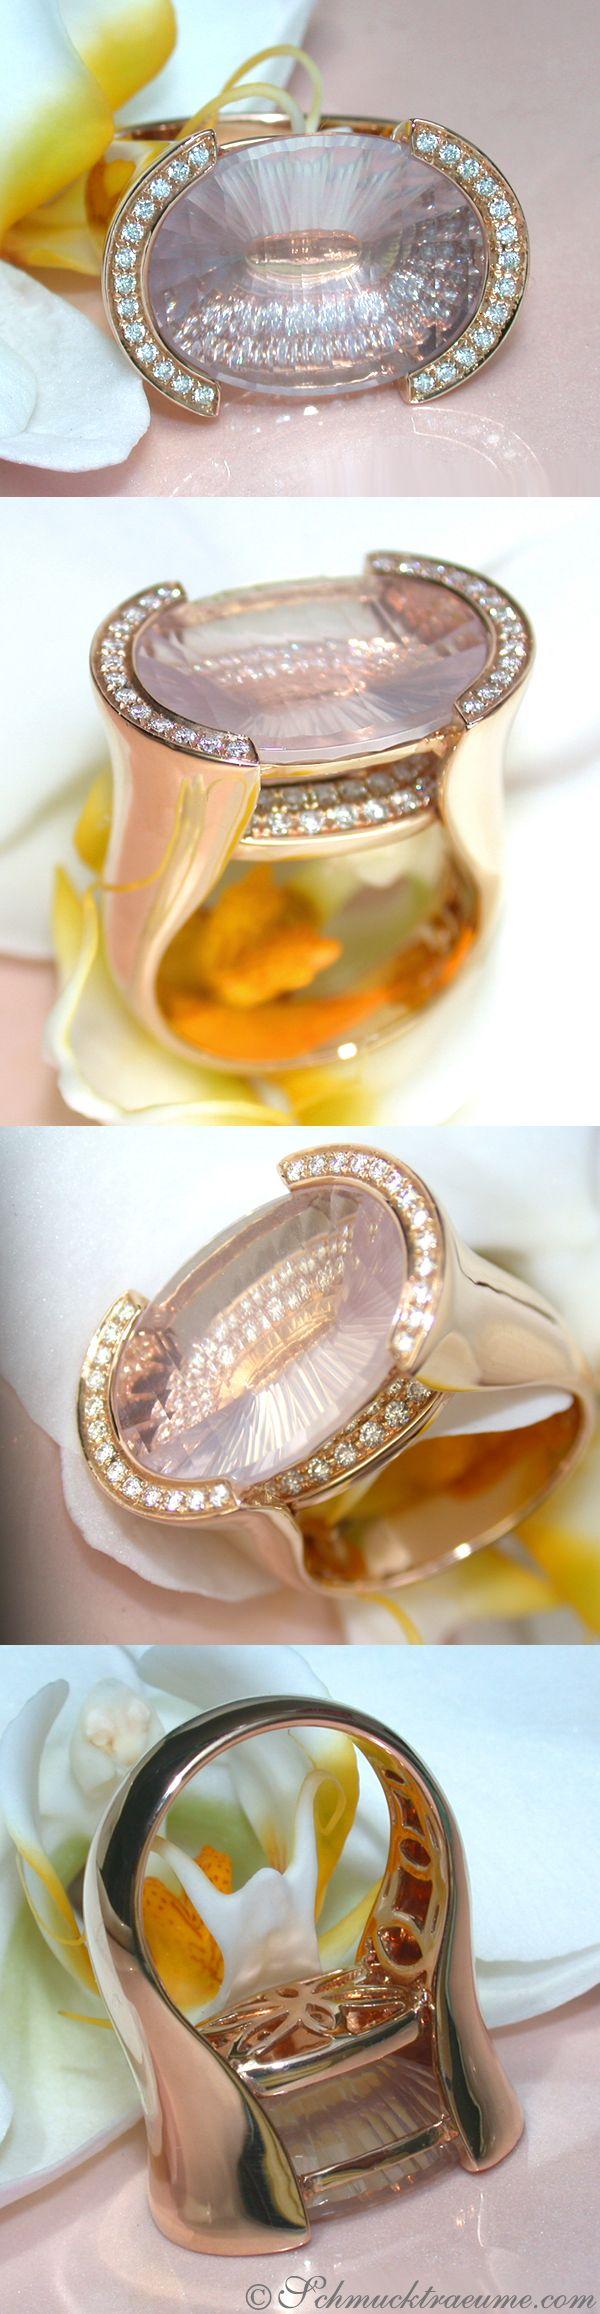 Unique Rose Quartz Diamond Ring, 16,88 ct. RG18K - Visit: schmucktraeume.com Mail: info@schmucktraeume.com Like: https://www.facebook.com/pages/Noble-Juwelen/150871984924926